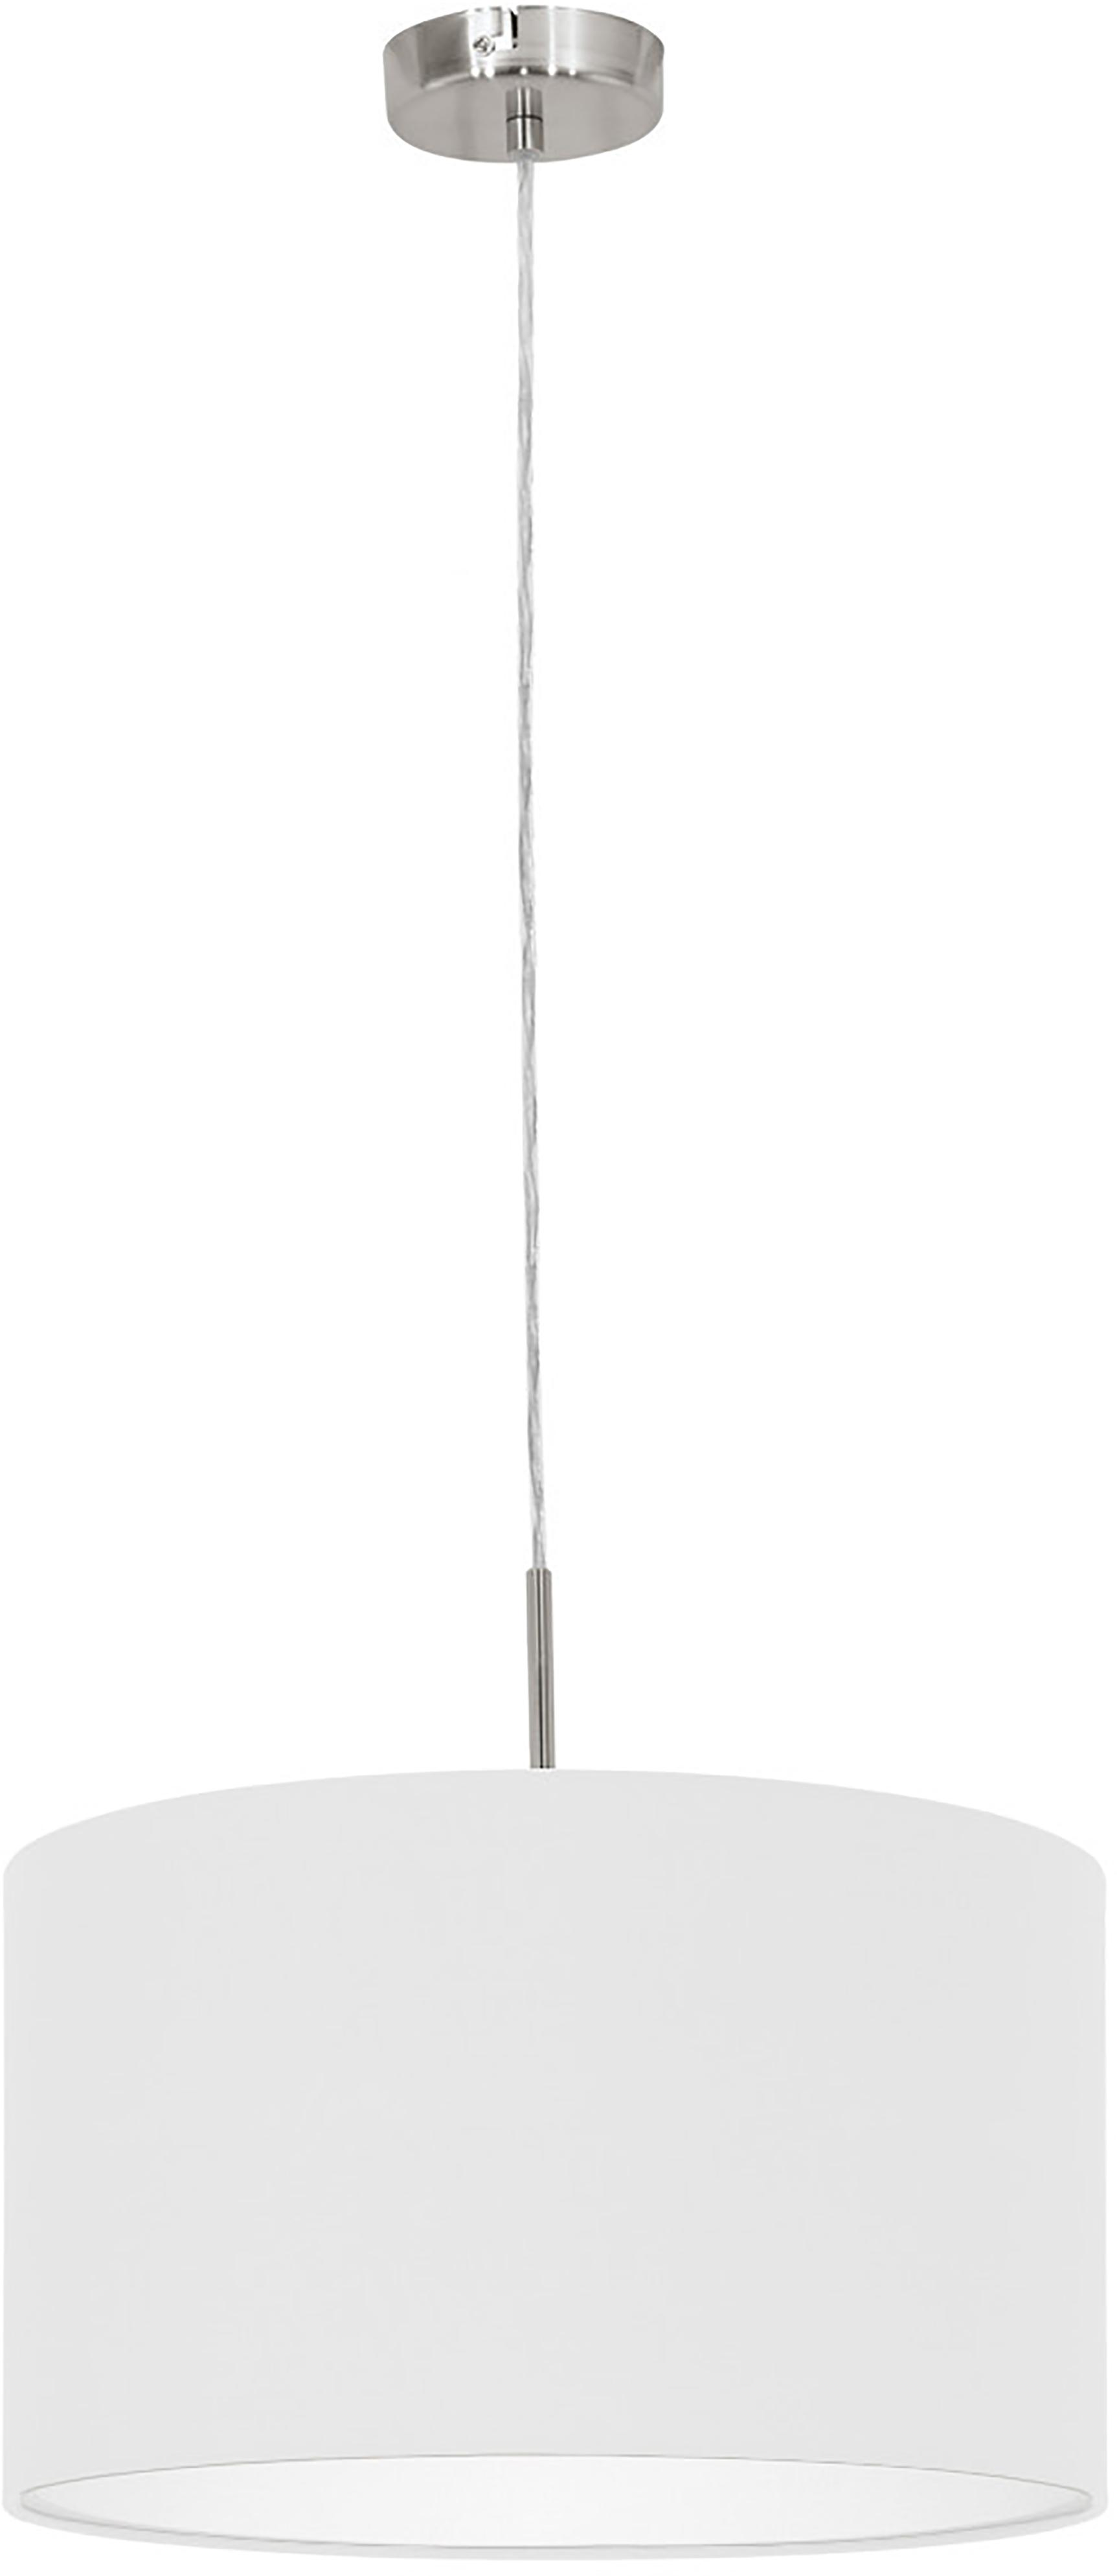 Lampada a sospensione Parry, Baldacchino: metallo nichelato, Paralume: tessuto, Argentato, Ø 38 x Alt. 22 cm